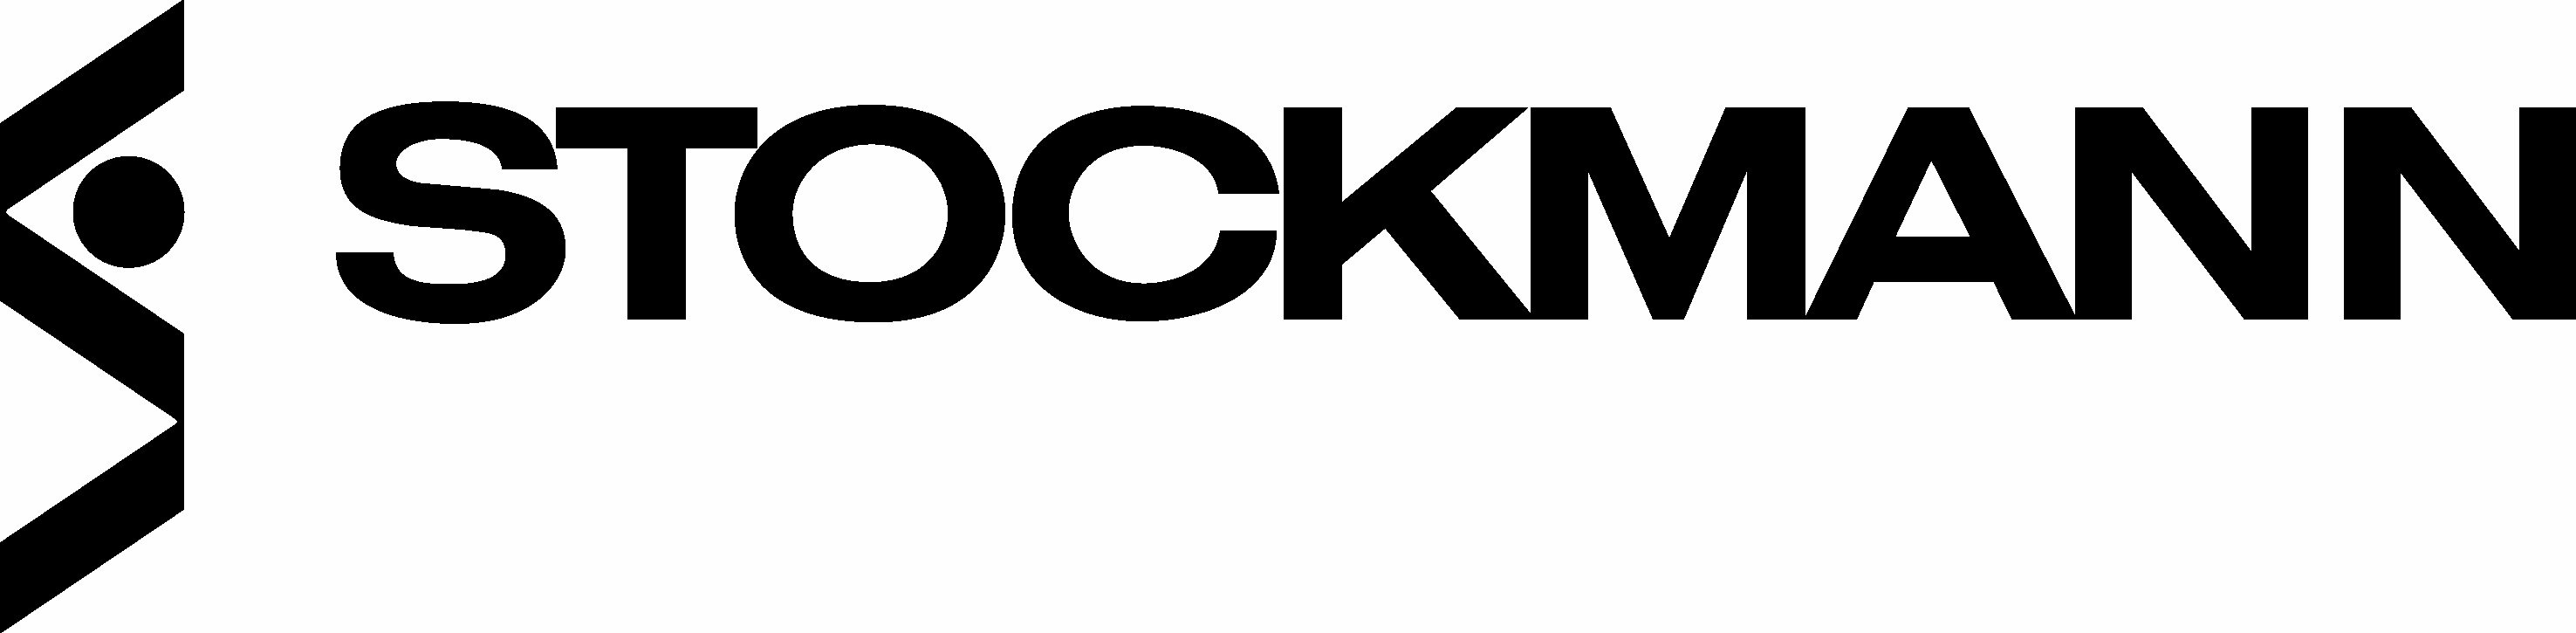 Stockmann-logo-bw